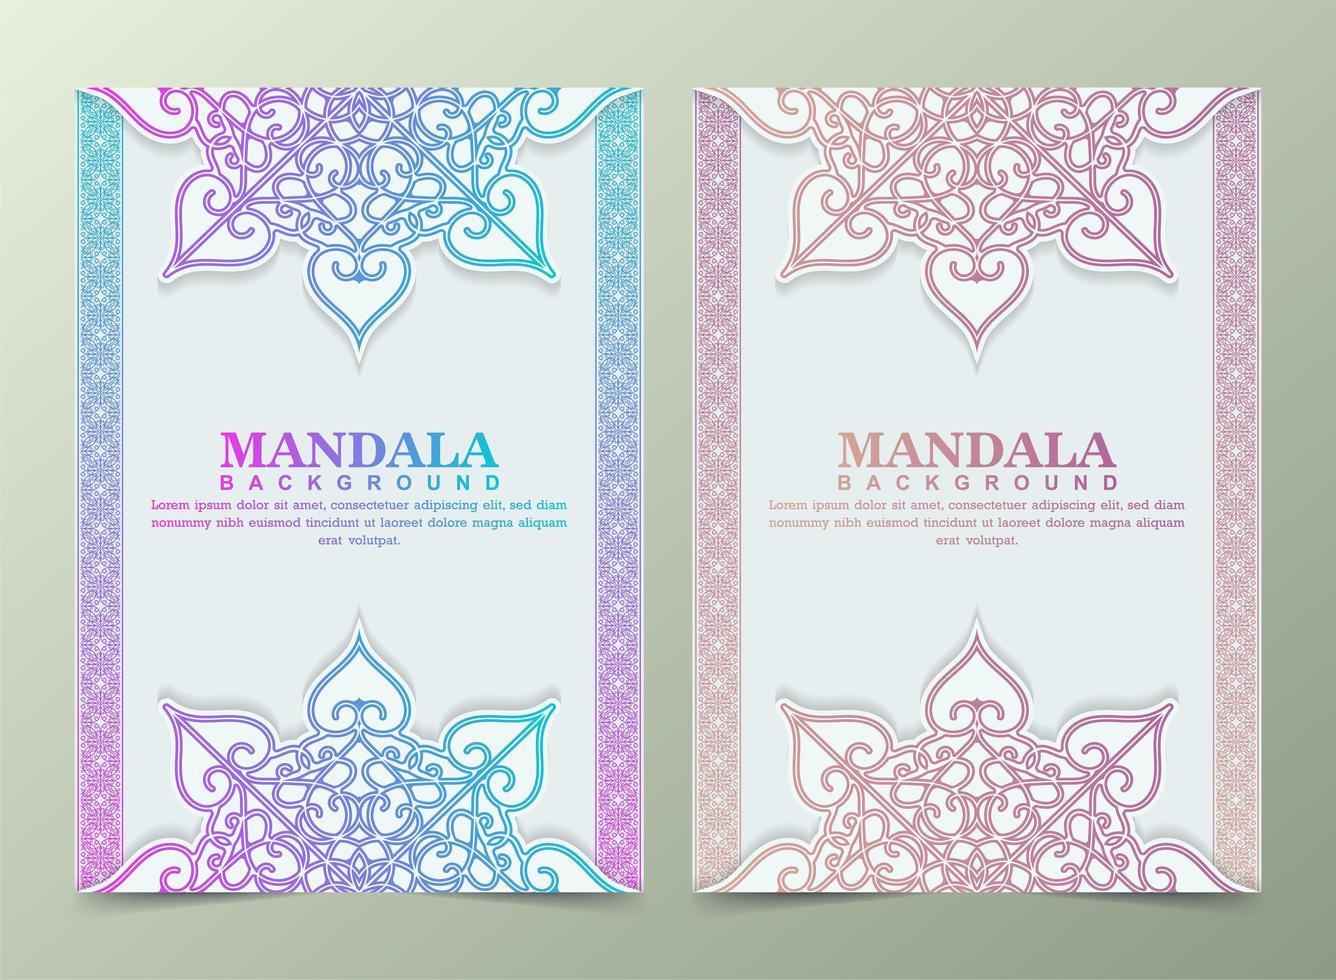 Vintage Grußkarte mit buntem Mandala-Motiv vektor